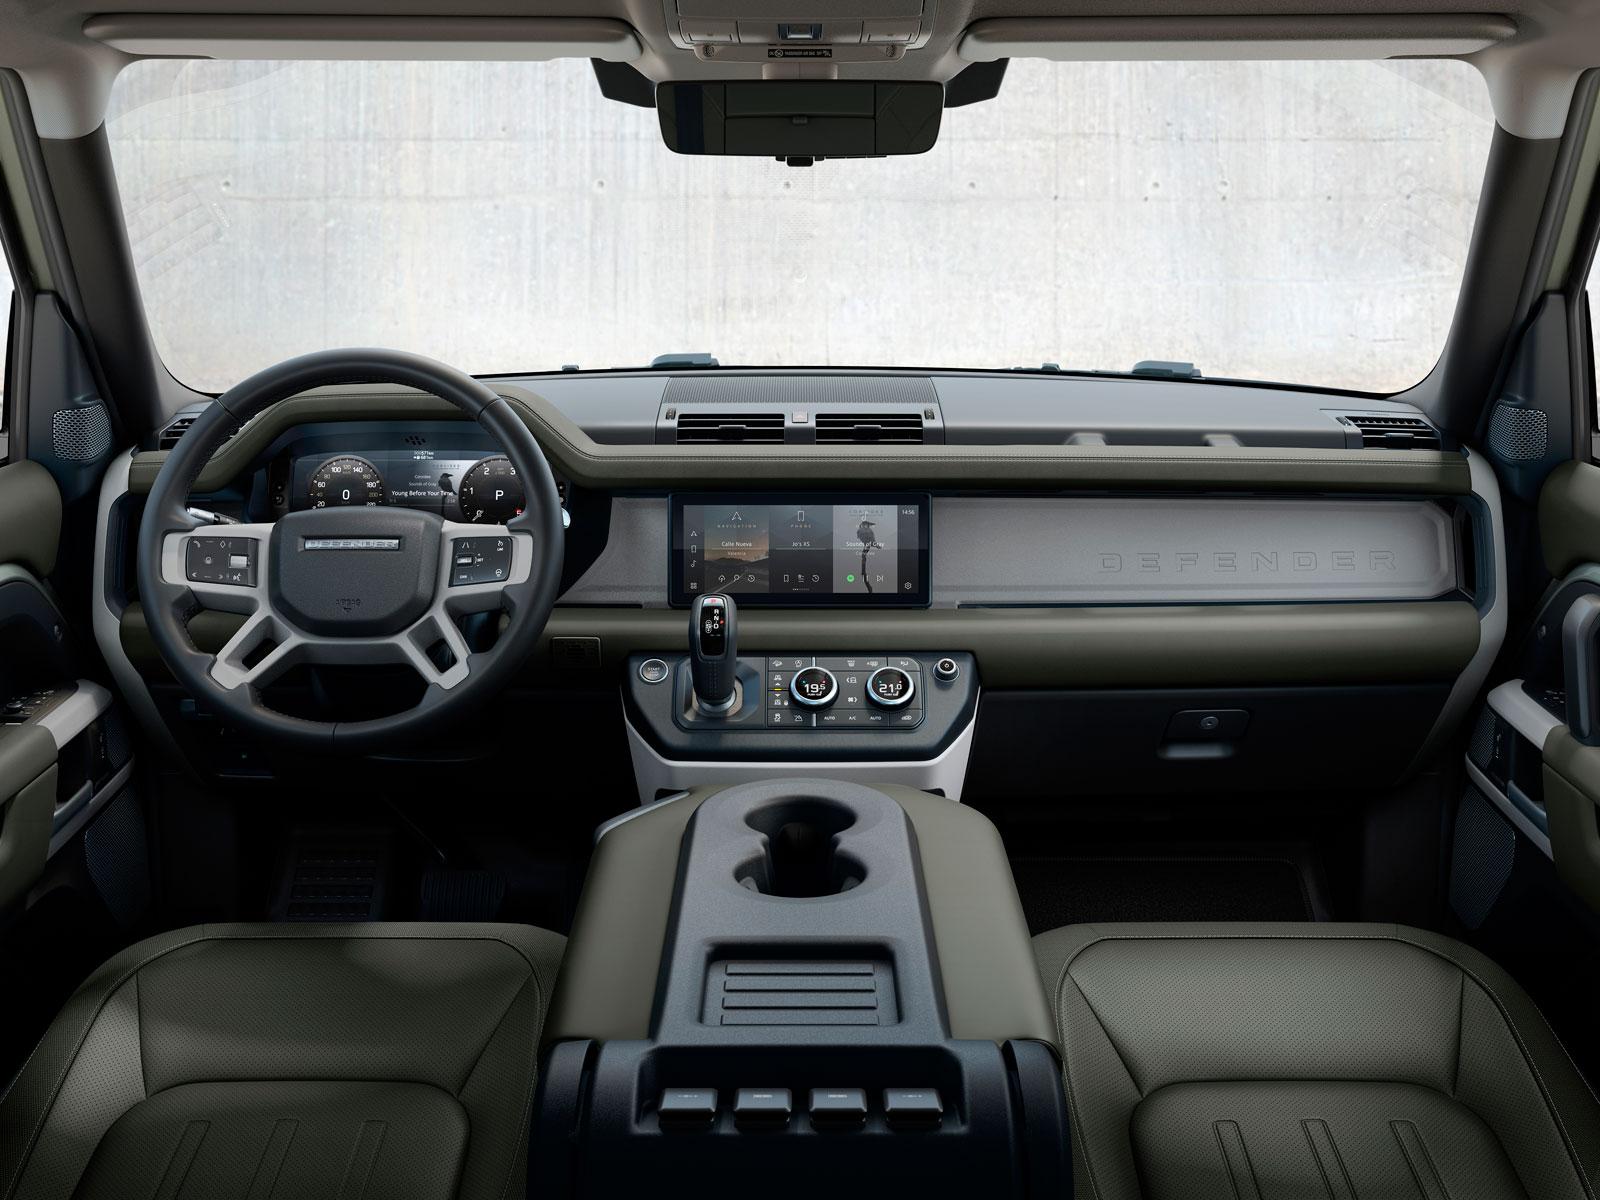 Mini Cooper Interior >> New Land Rover Defender Interior Design - Car Body Design